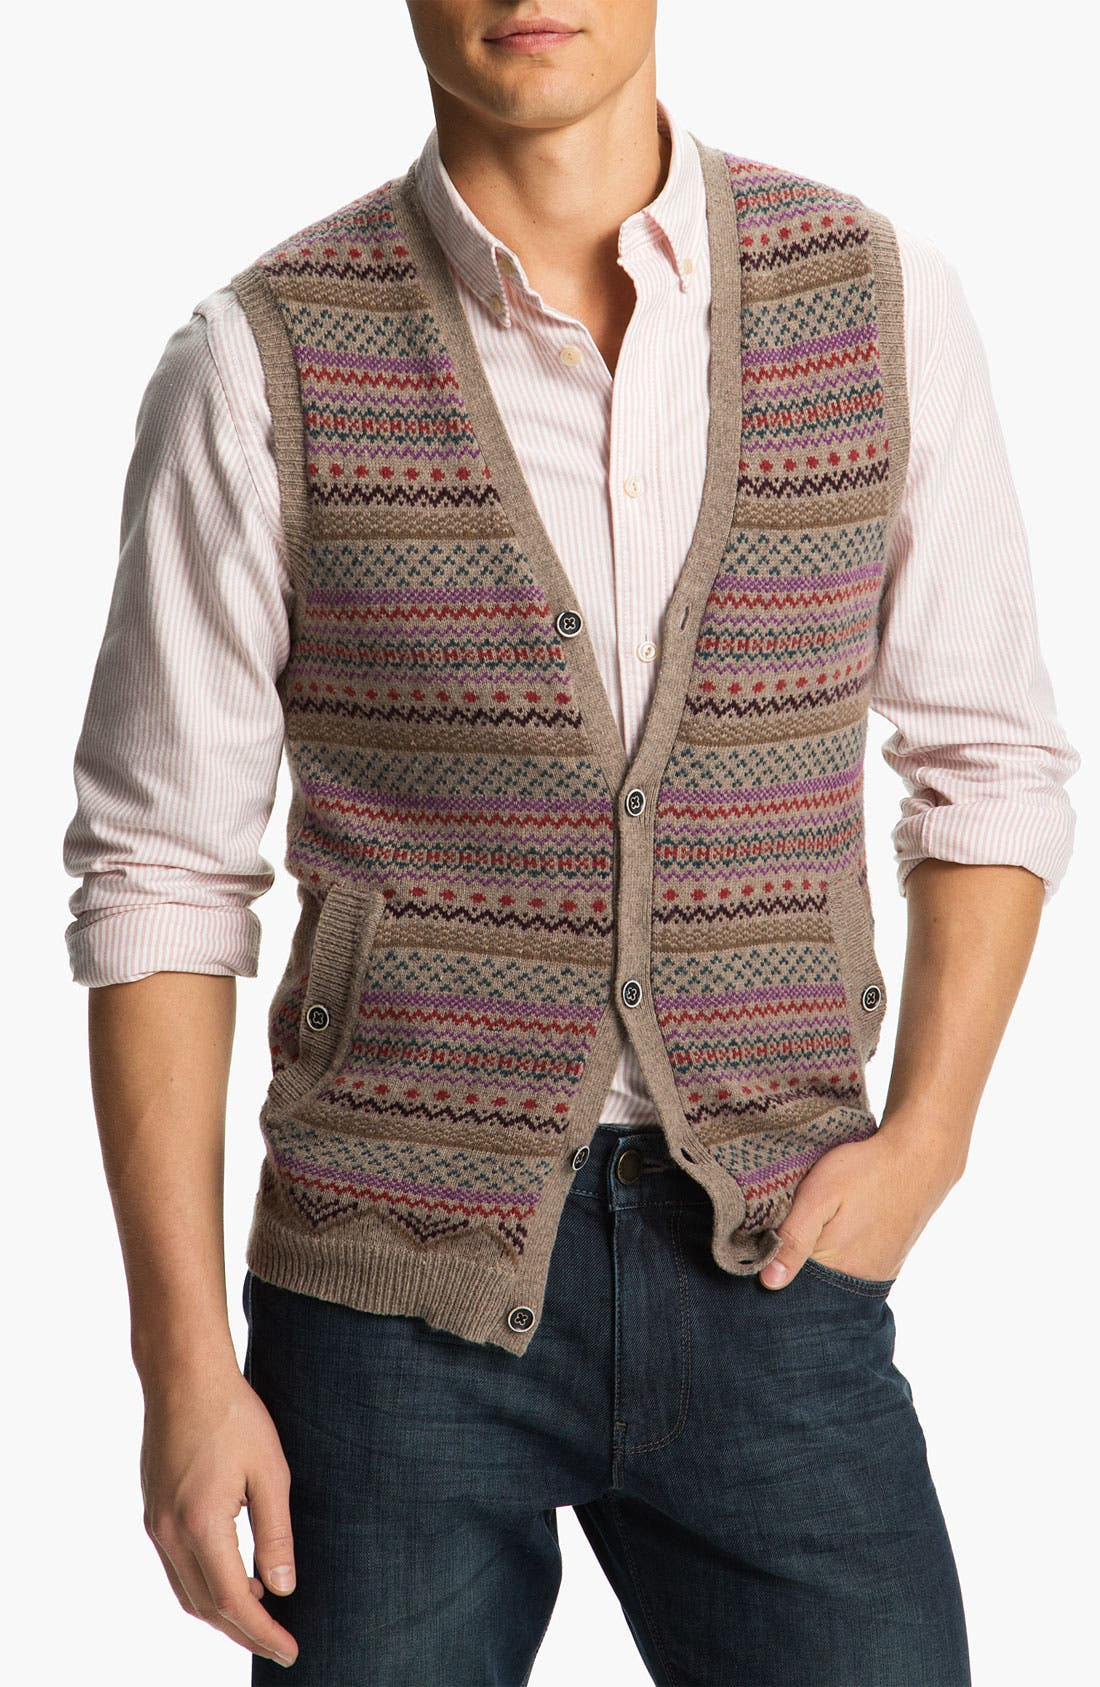 Main Image - Ted Baker London 'Fairmun' Sweater Vest